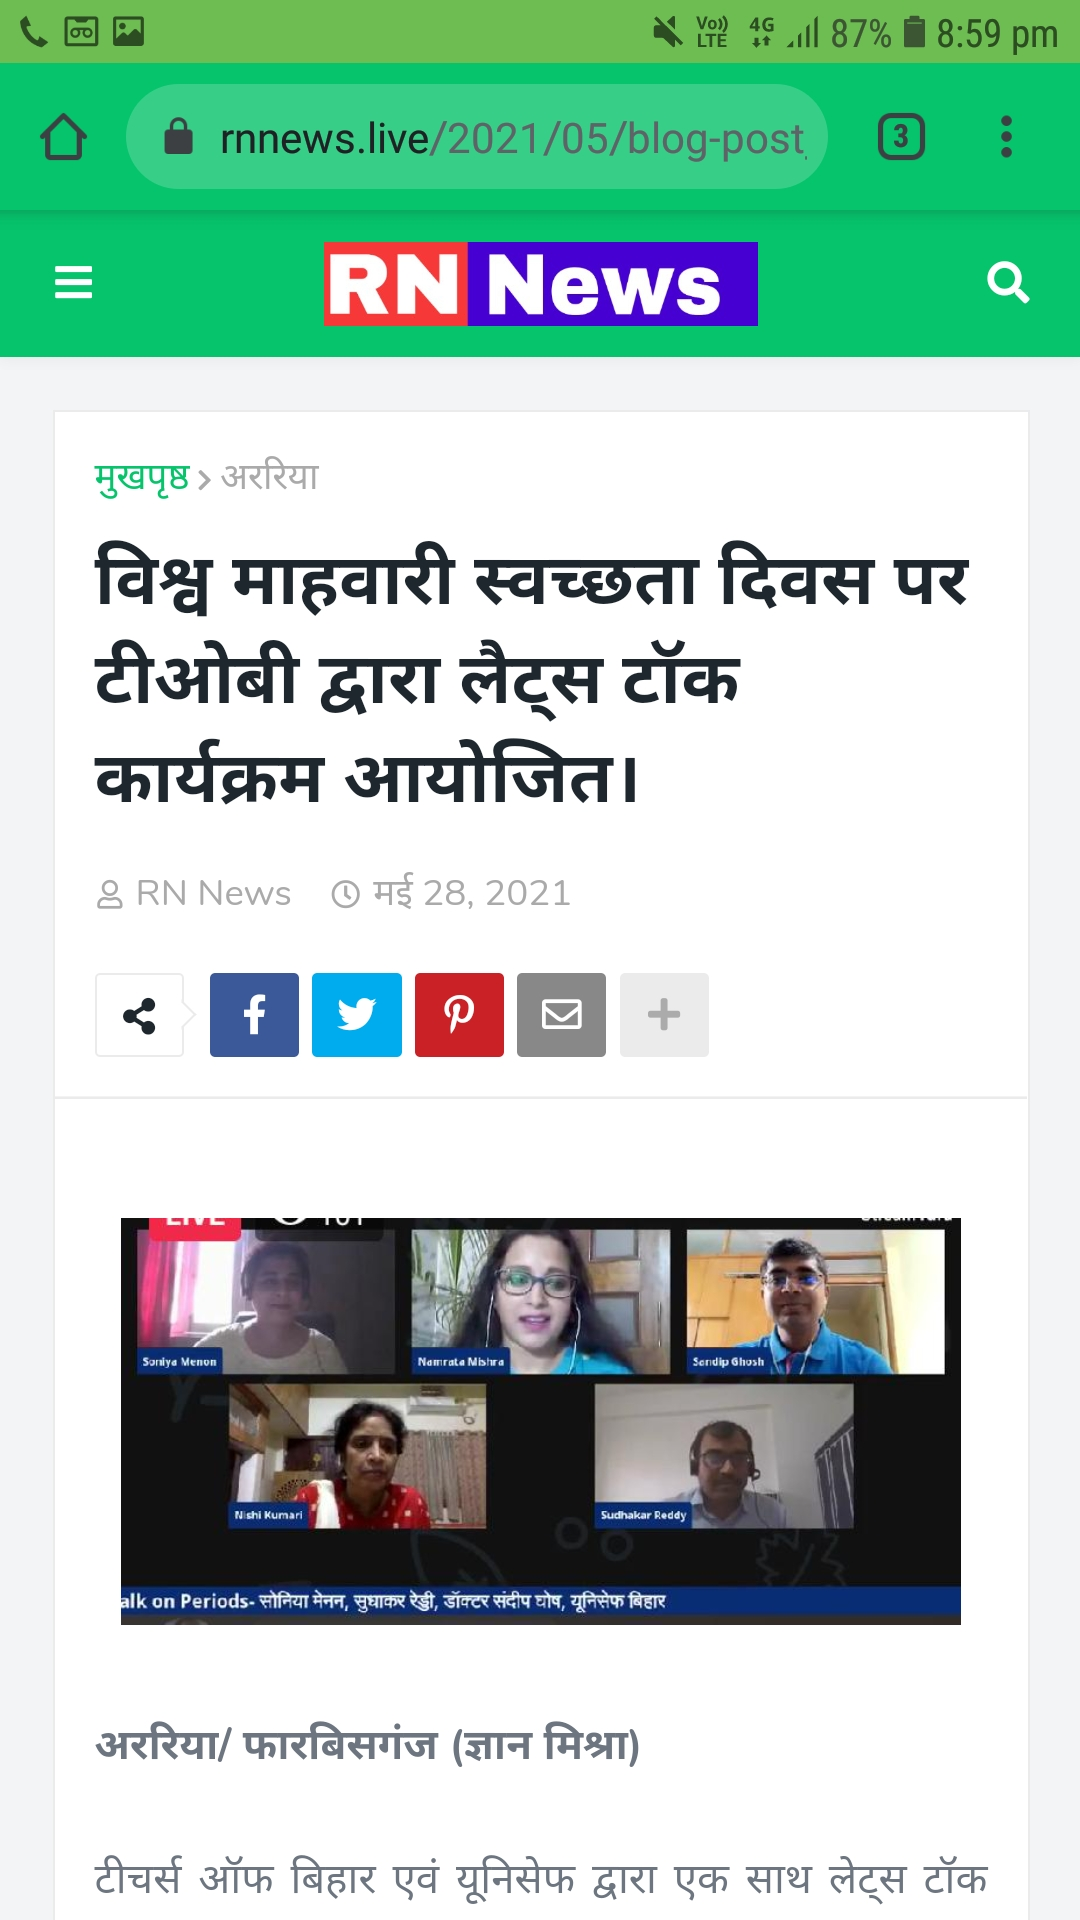 Teachers of Bihar : Let'sTalk program on Menstrual Hygiene Day , 29th May 2021, RN News